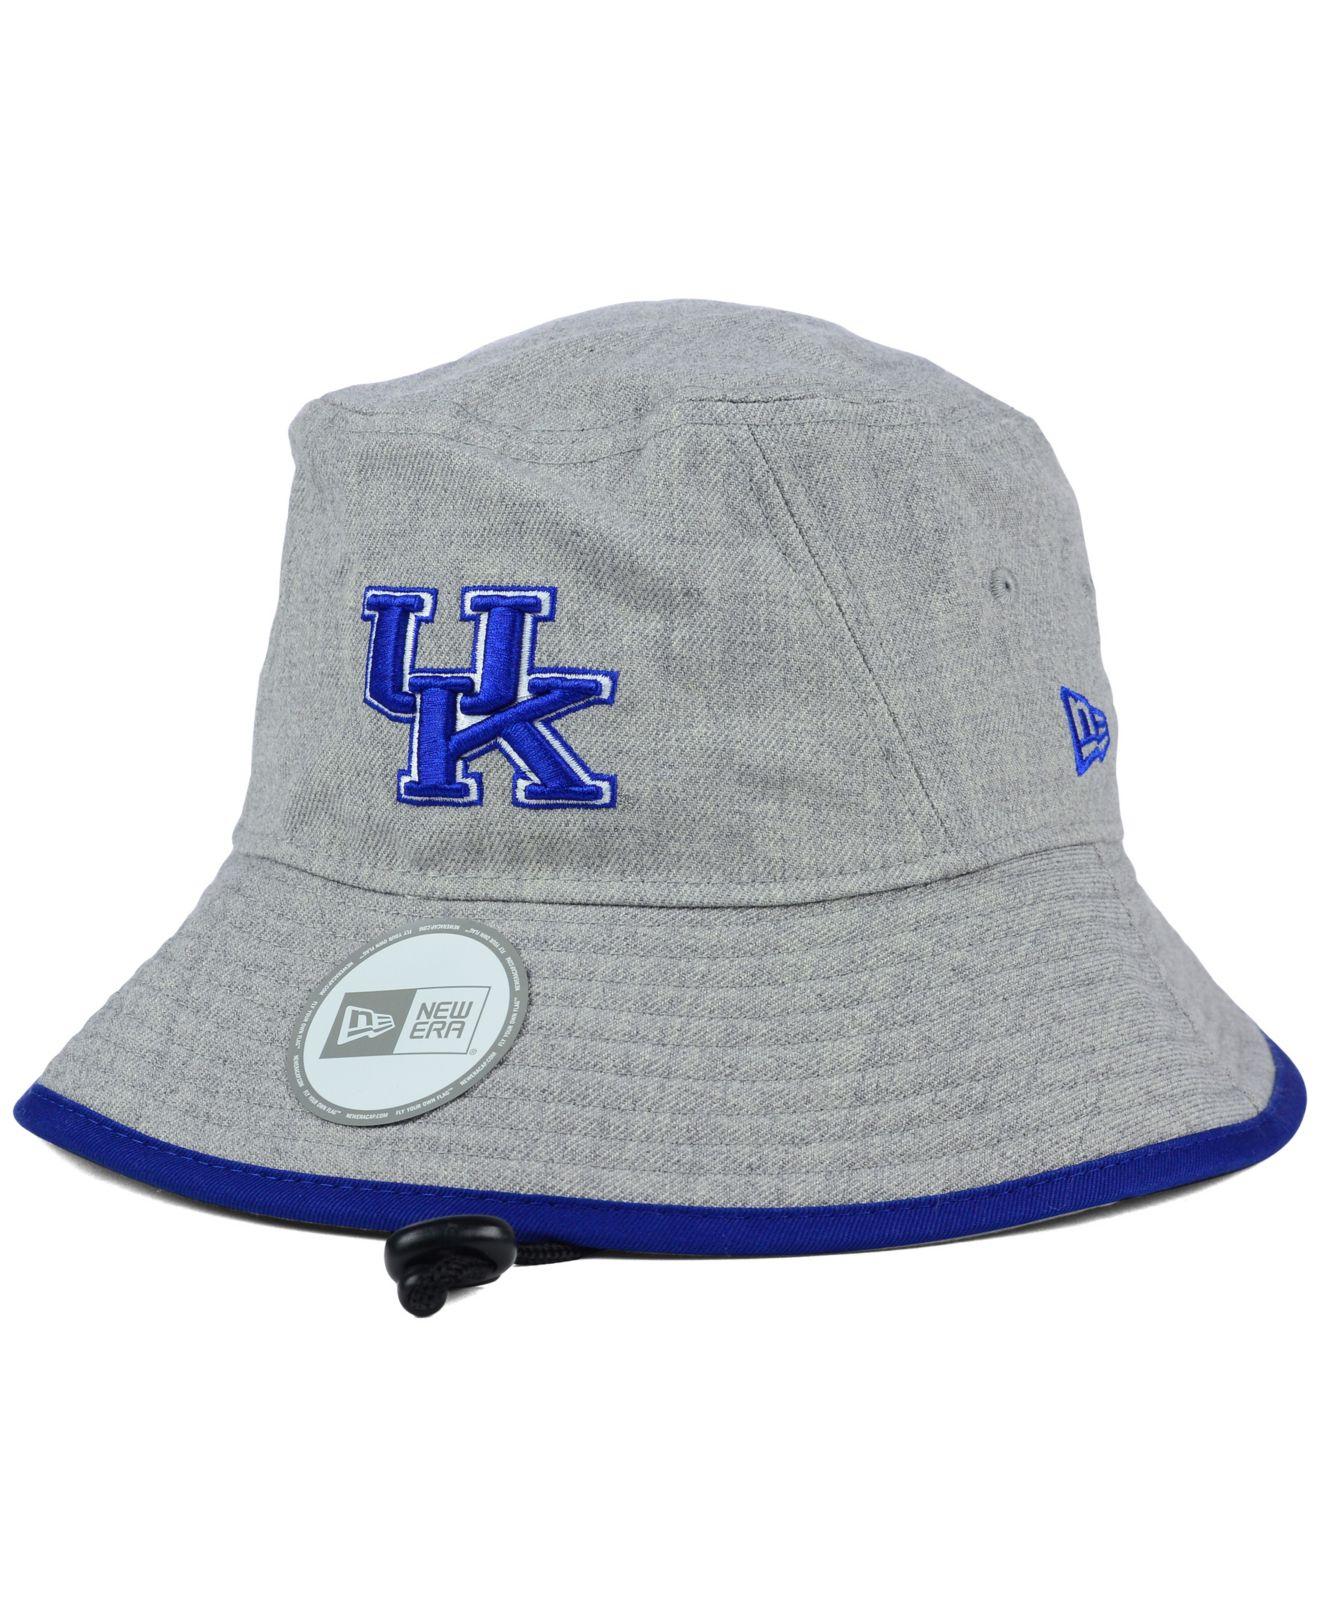 outlet store bac20 42cc2 ... italy lyst ktz kentucky wildcats tip bucket hat in gray b06d9 8e2b6